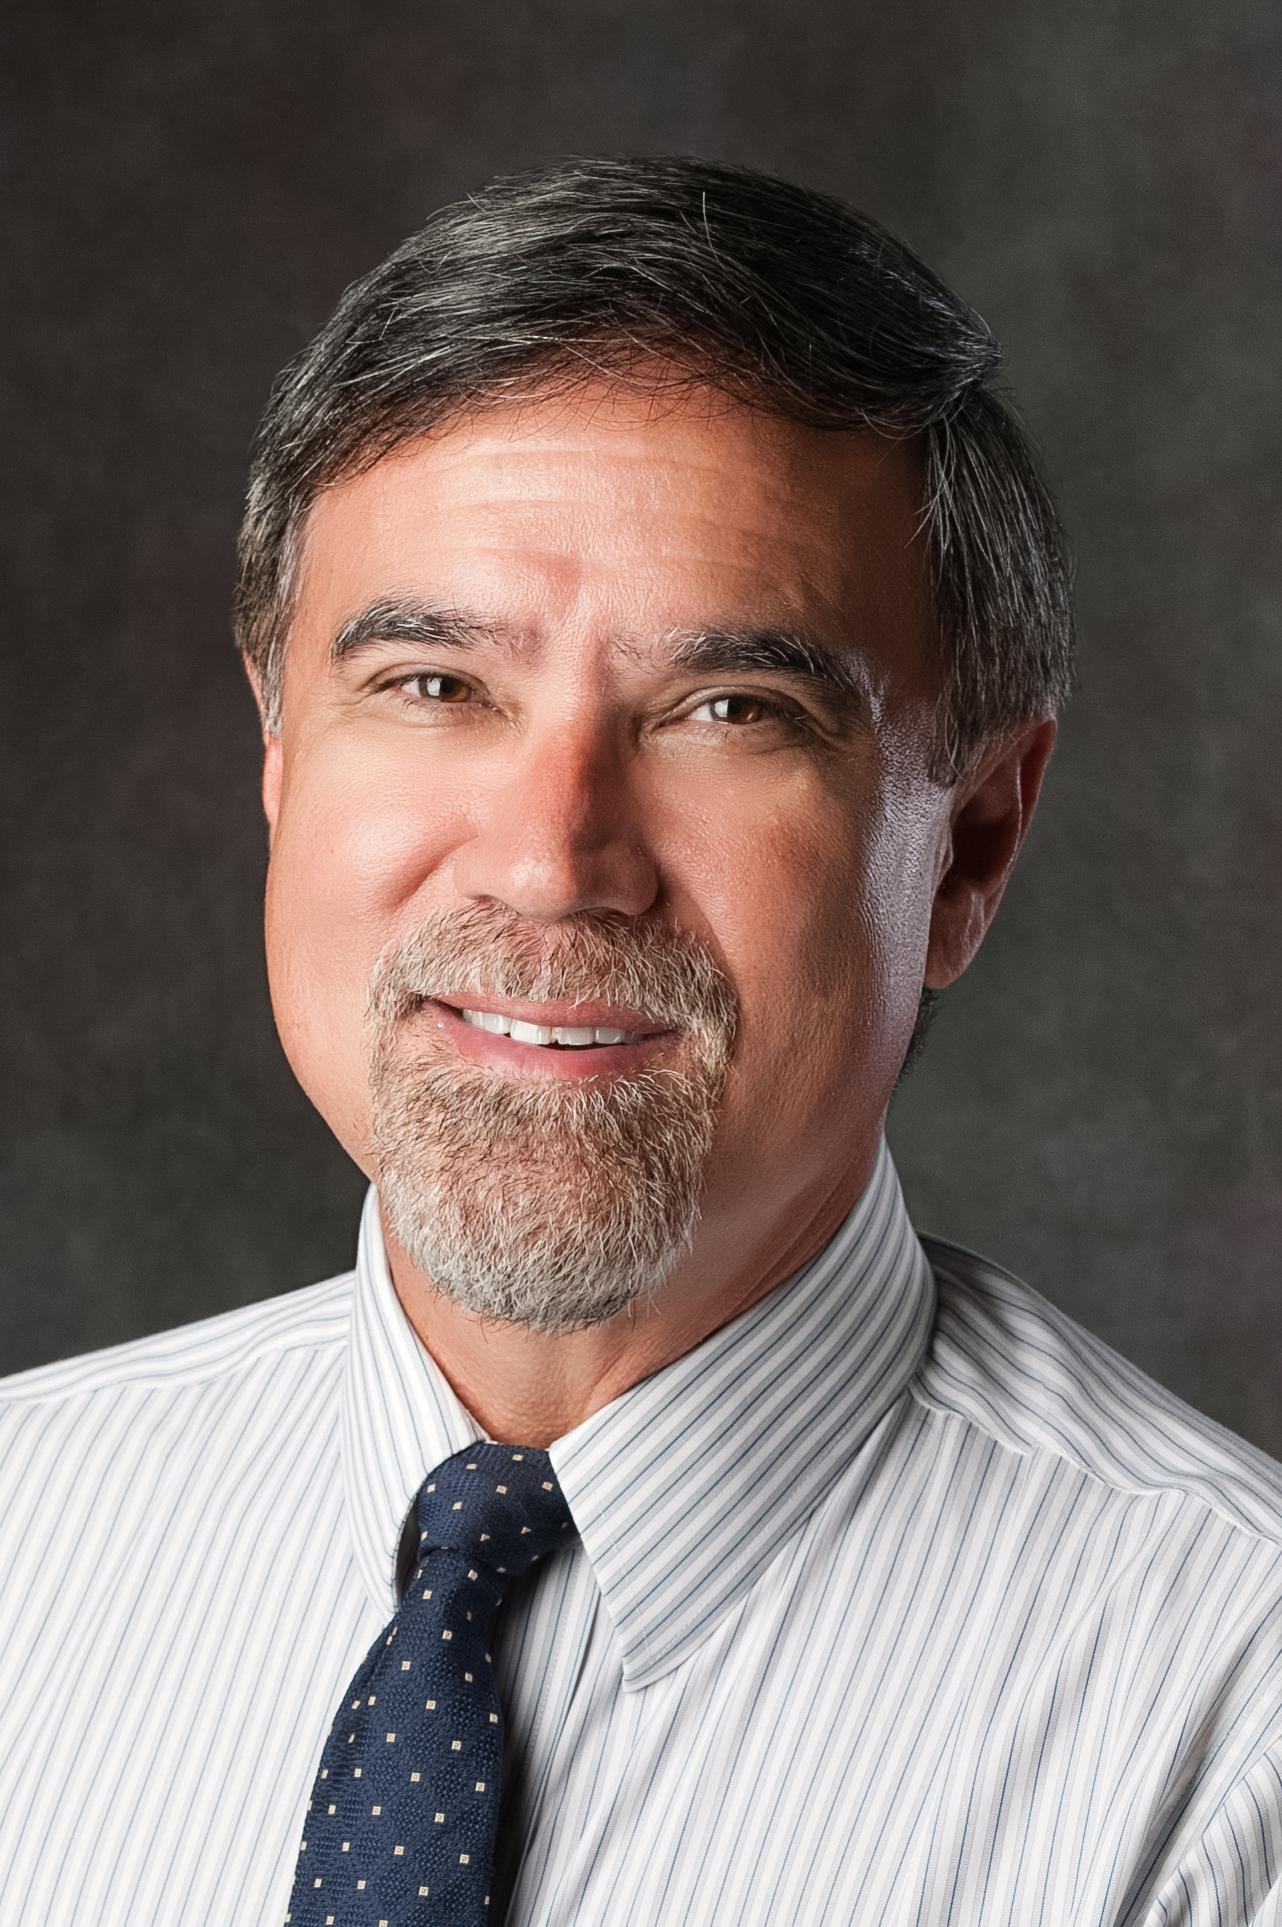 Dr. Robert Rowland